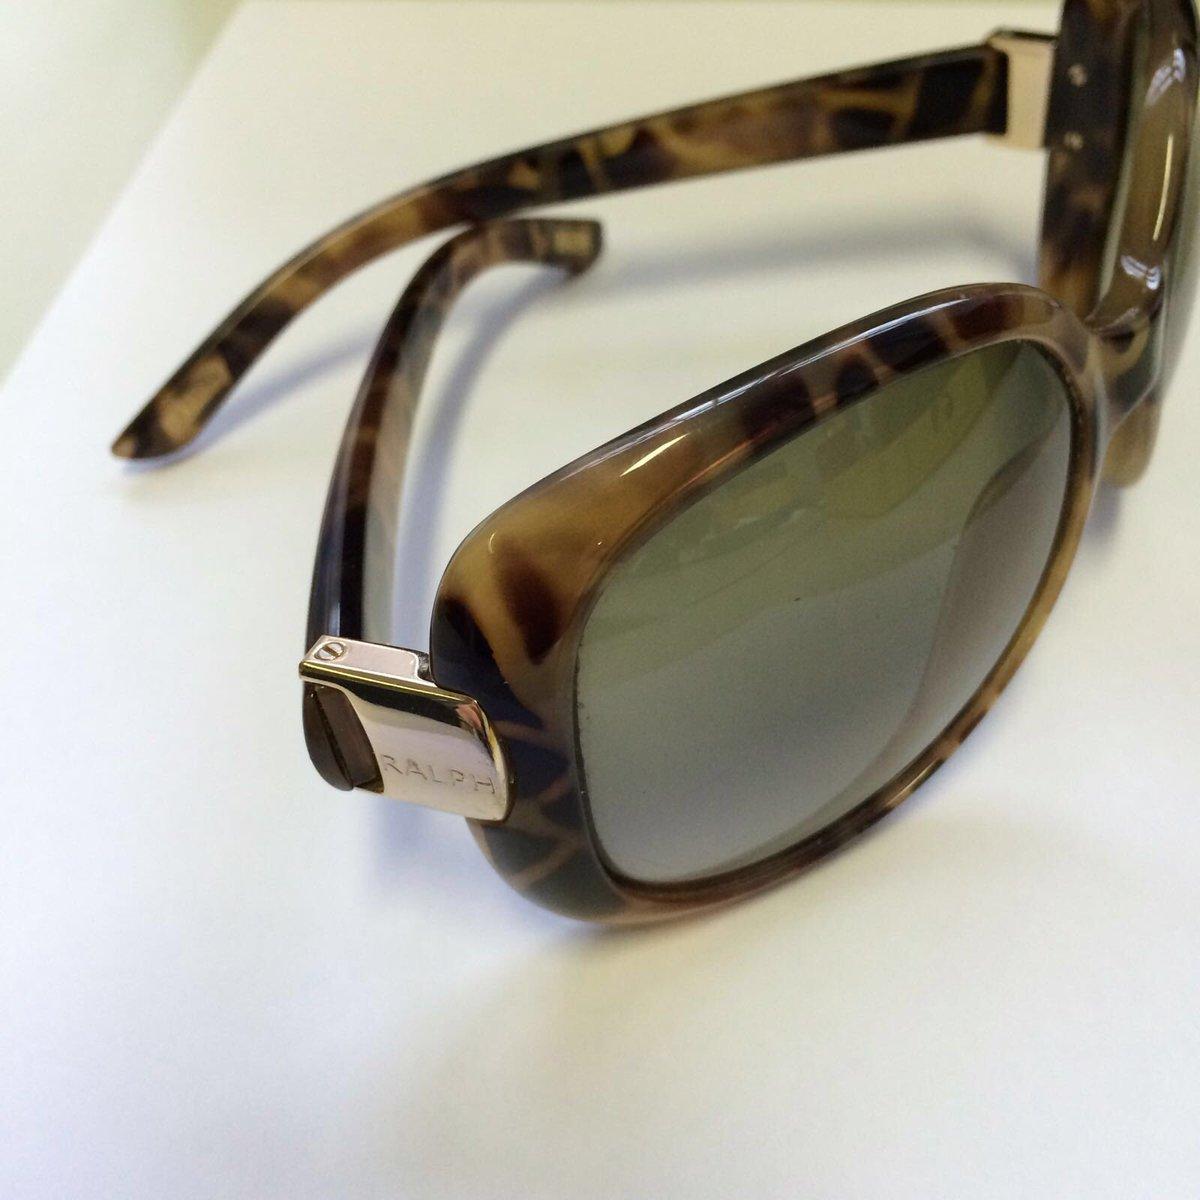 34dd6b704e  repairs  sunglasses  OPTICAL http   www.specrepairs.com  Info specrepairs.compic.twitter.com UtmU7aOEYL